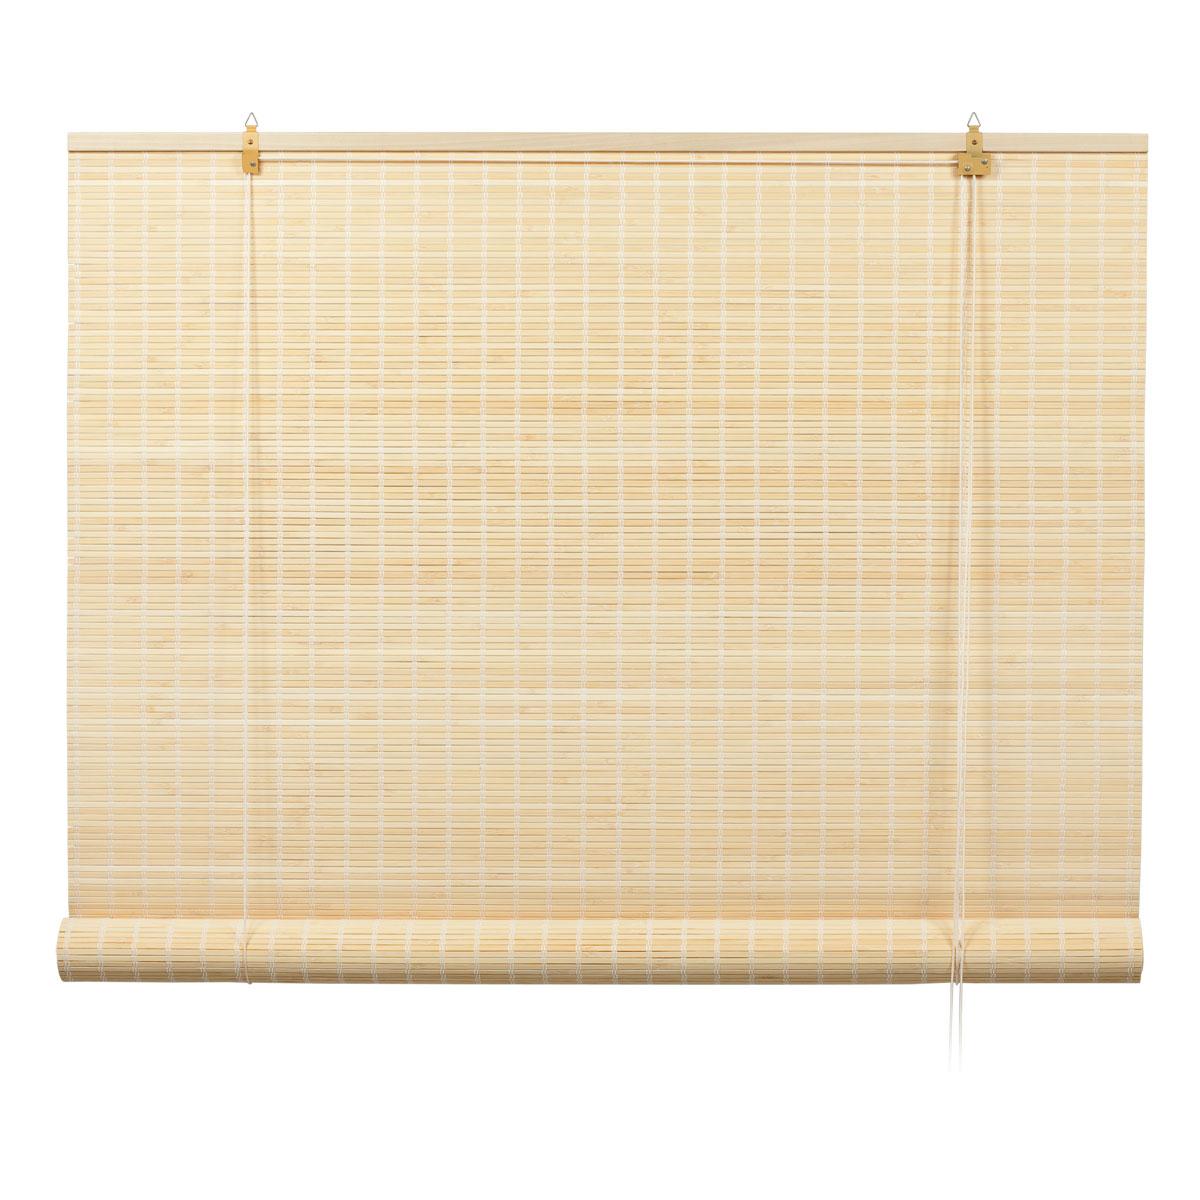 bambusrollo in vielen gr en. Black Bedroom Furniture Sets. Home Design Ideas